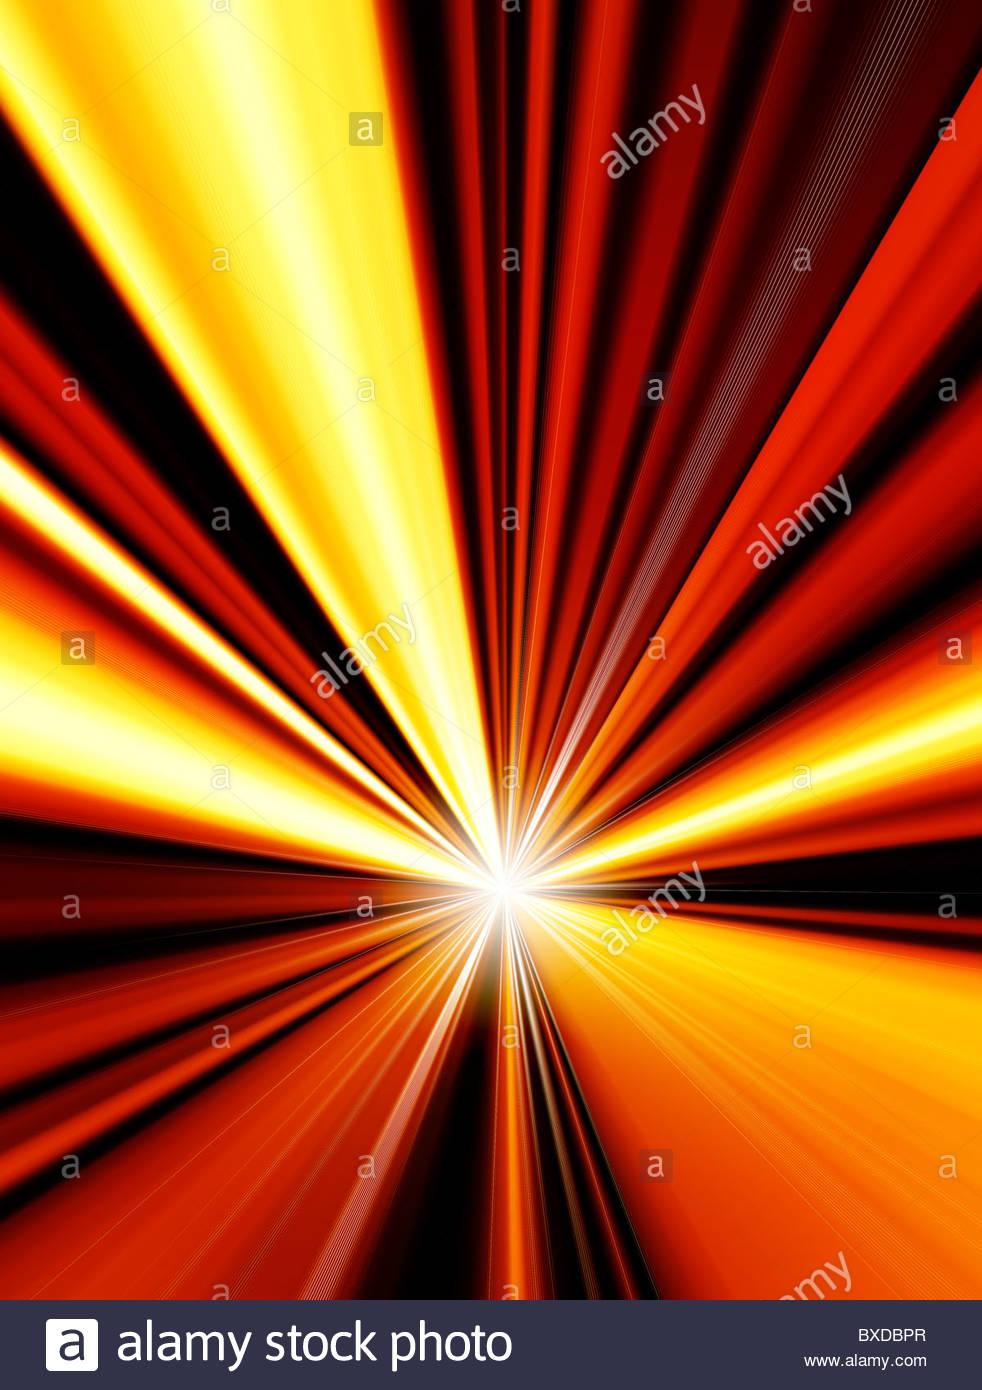 Dynamic starburst background illustration - Stock Image